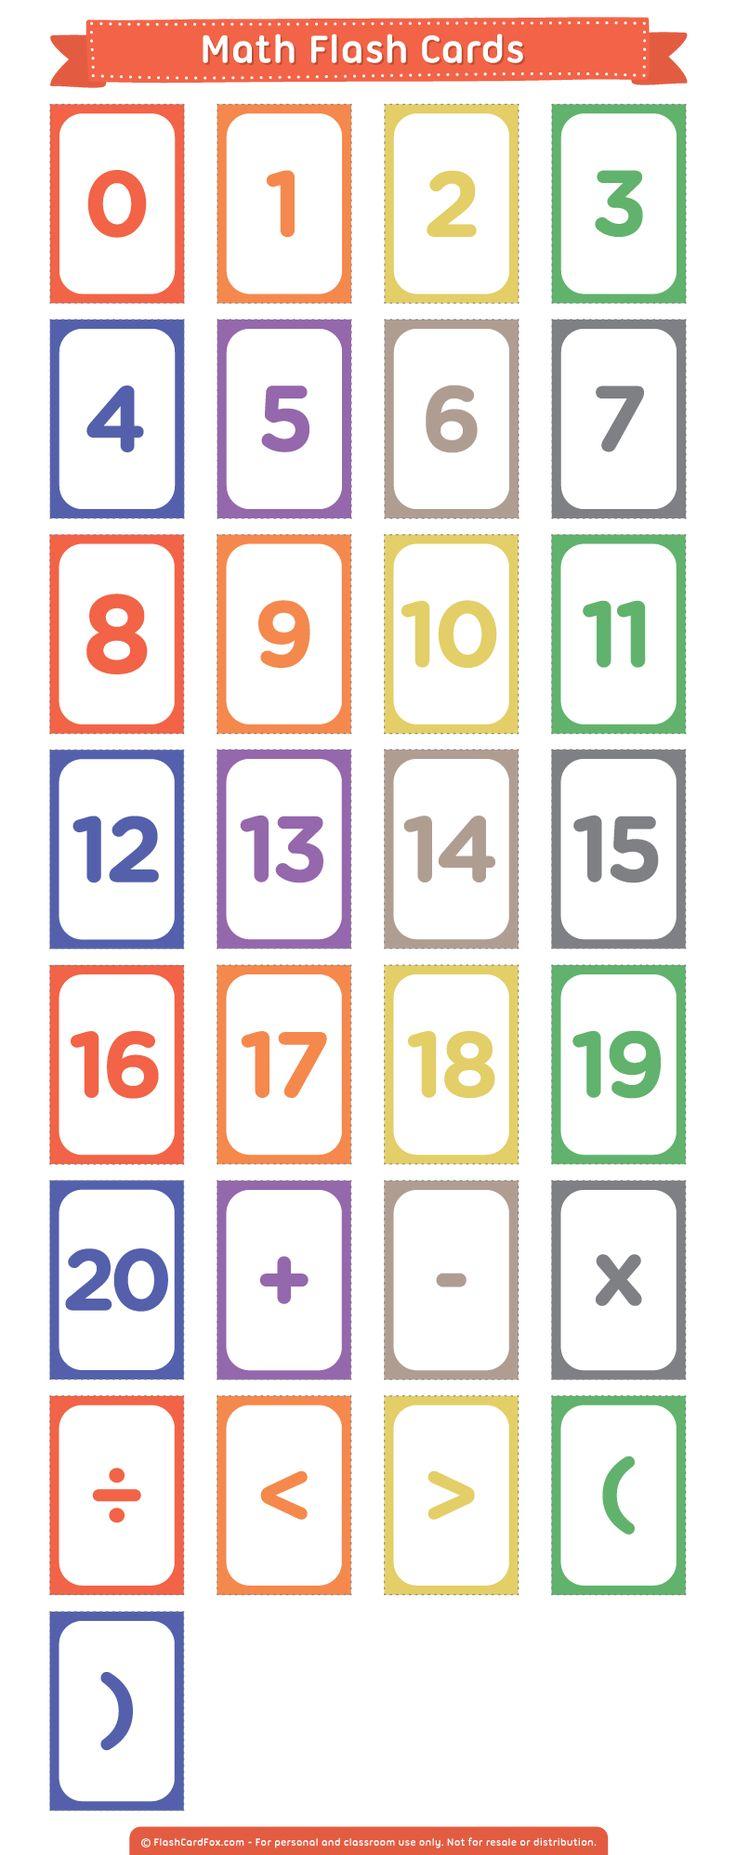 best 25 math flash cards ideas on pinterest multiplication practice teaching multiplication. Black Bedroom Furniture Sets. Home Design Ideas